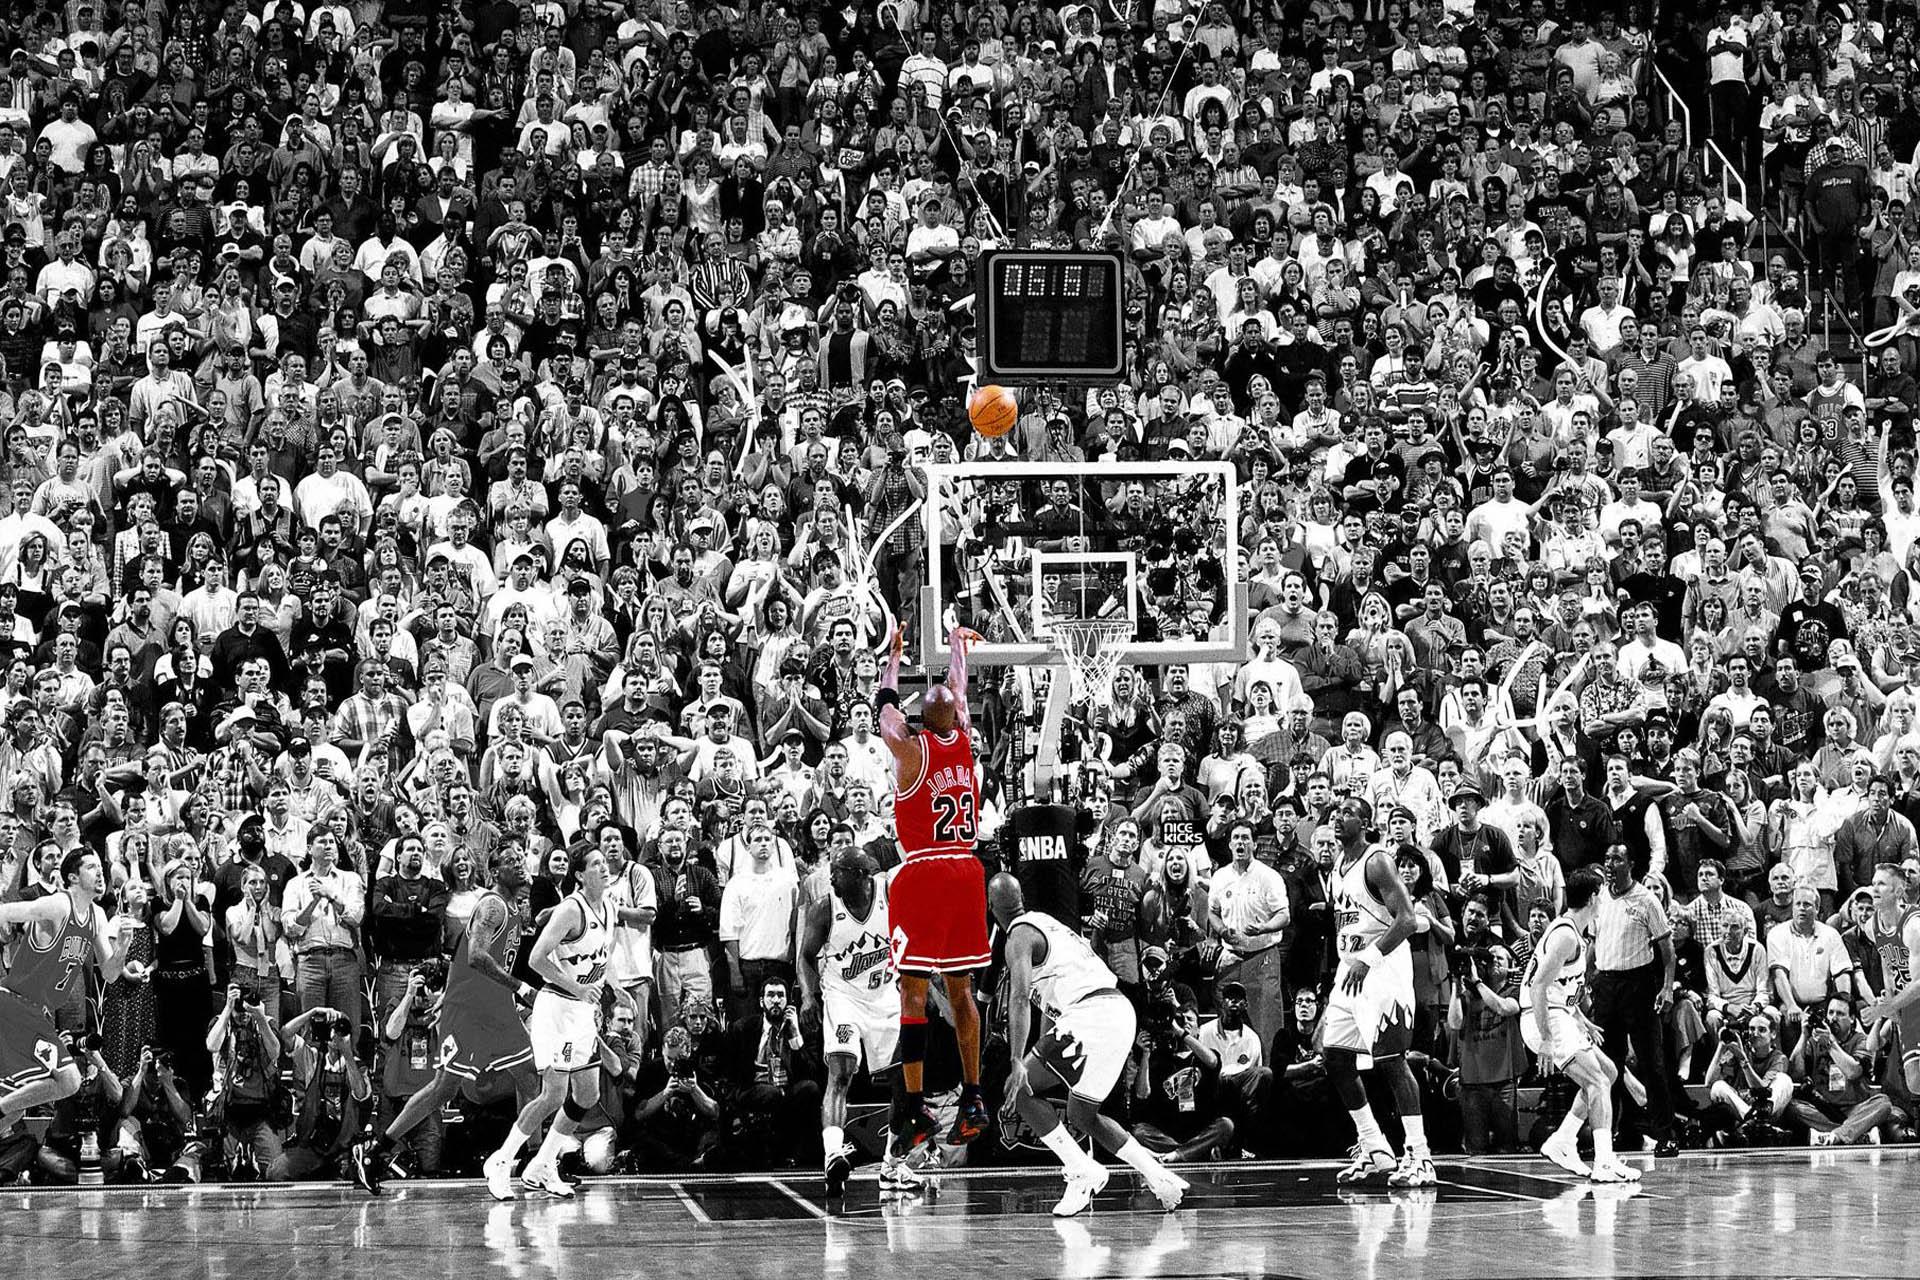 Michael Jordan Wallpapers Images Photos Pictures Backgrounds 1920x1280 1920x1280